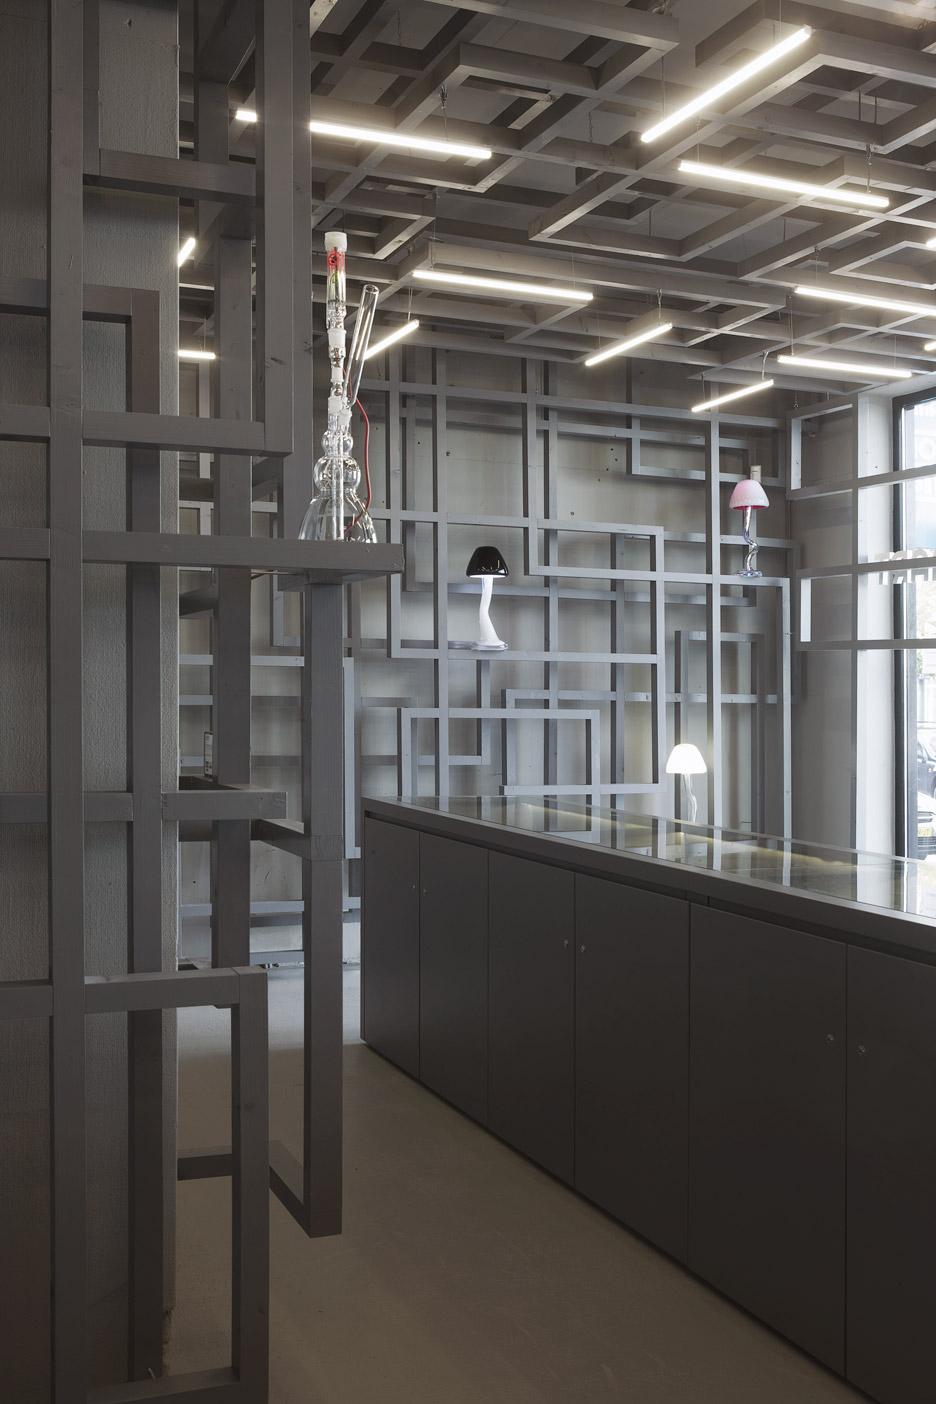 architecture-design-studia-interiors-osnovadesign-osnova-ukraine-poltava-kyev-dnepropetrovsk-kharkov-odessa-lviv-poltava-08